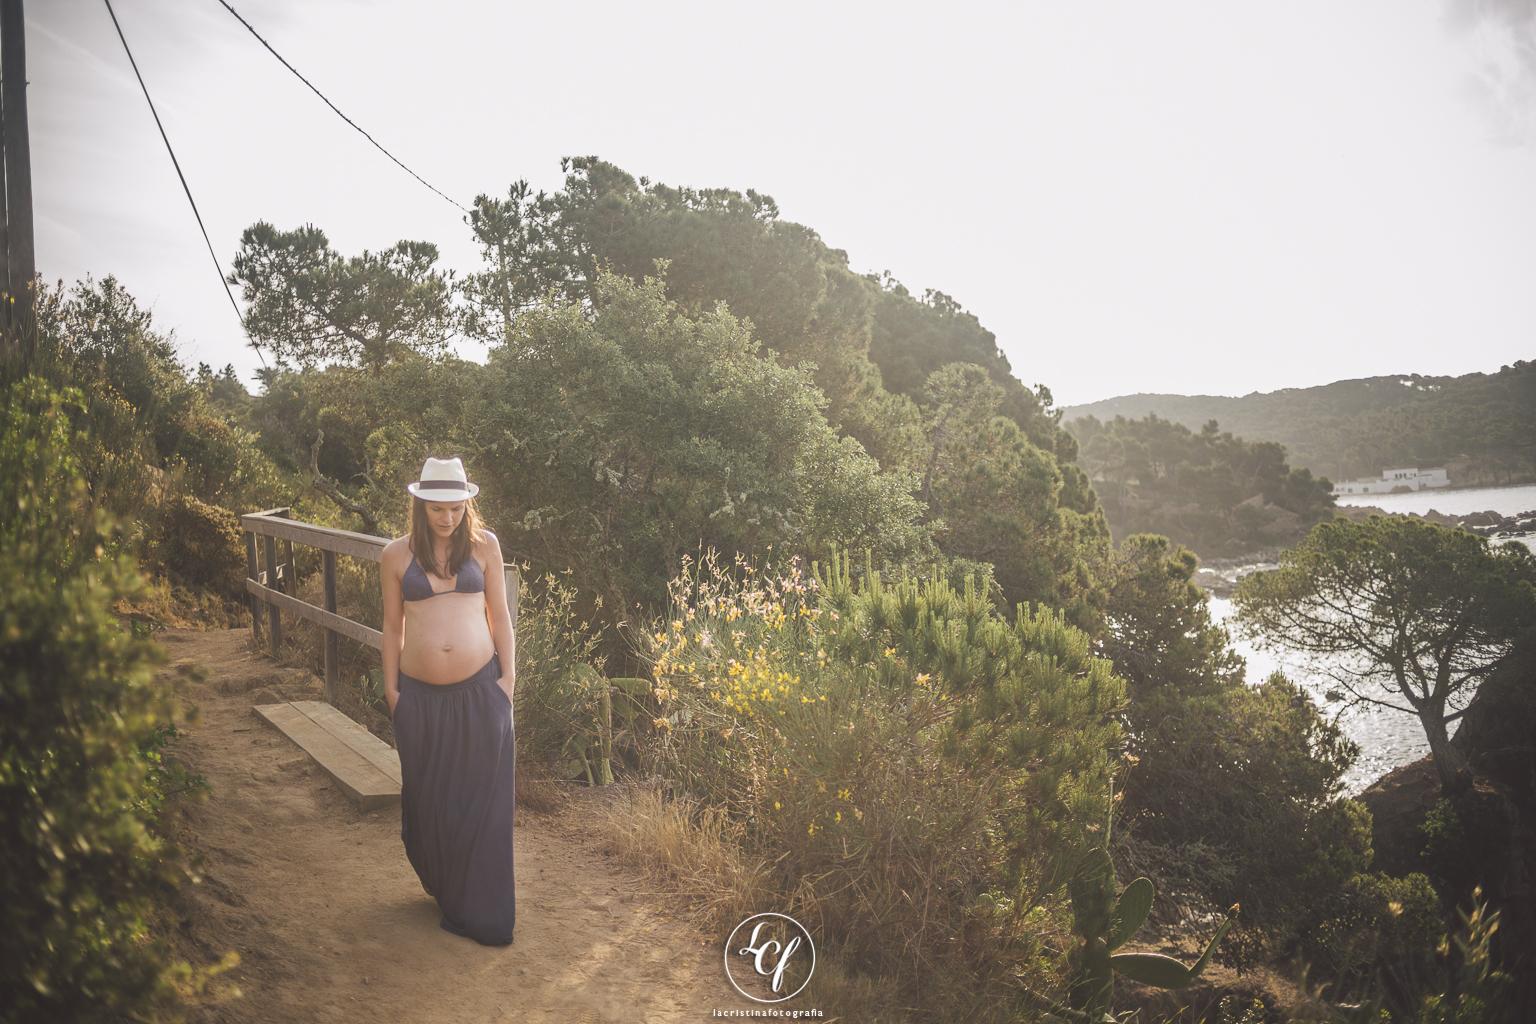 fotografía embarazada costa brava :: fotógrafo embarazado girona :: fotografía de embarazada en la playa :: fotografía natural barcelona